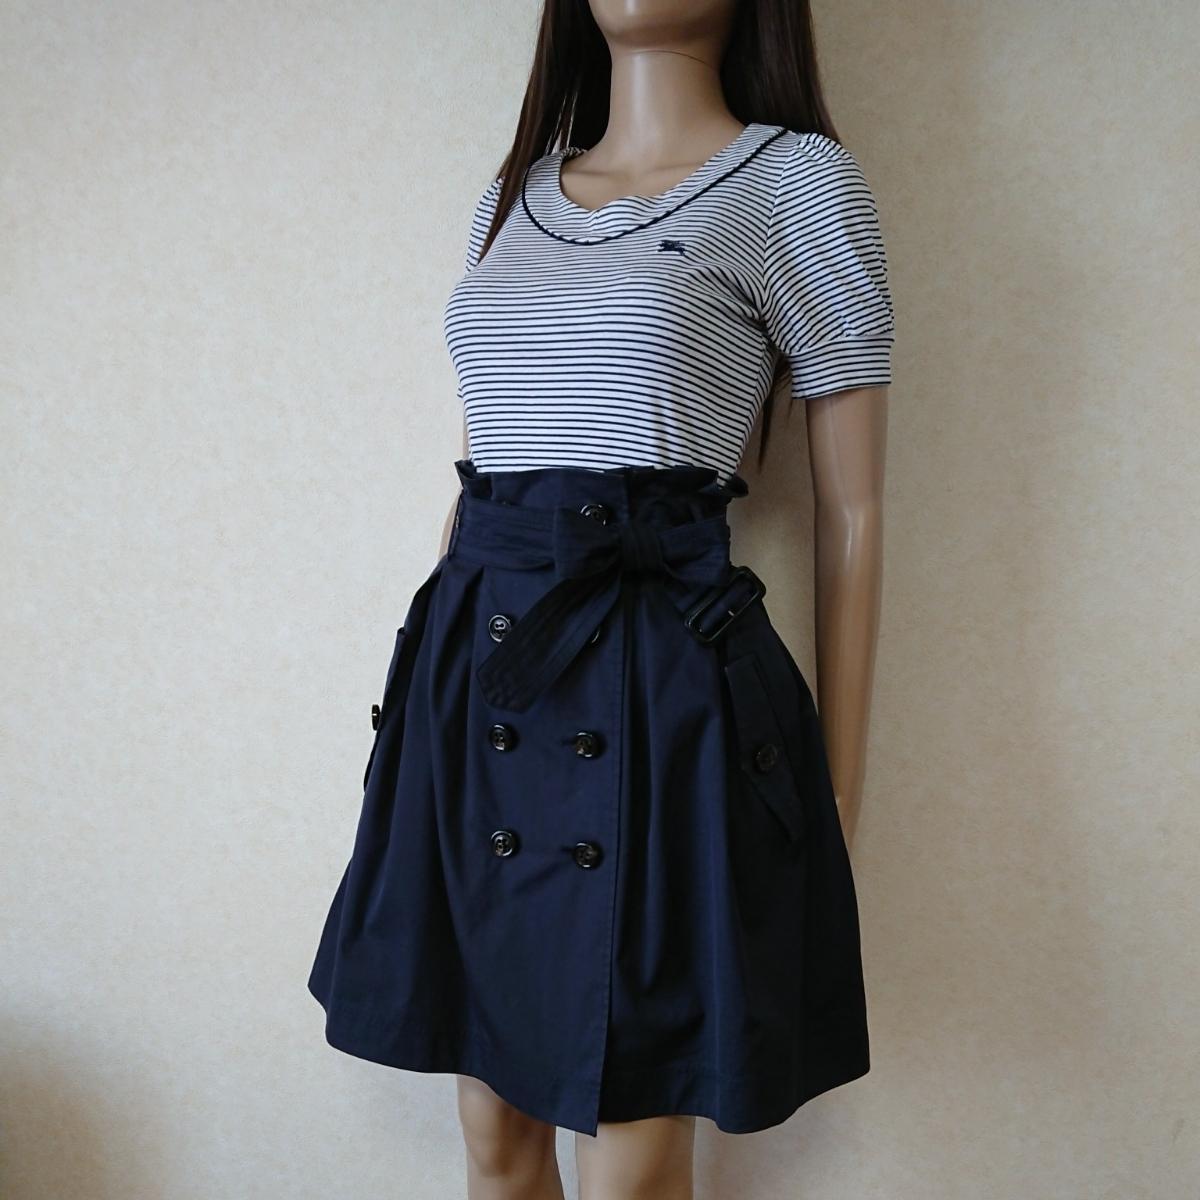 38☆BURBERRY BLUELABEL バーバリーブルーレーベル トレンチスカート ネイビー ドッキングワンピースのように♪